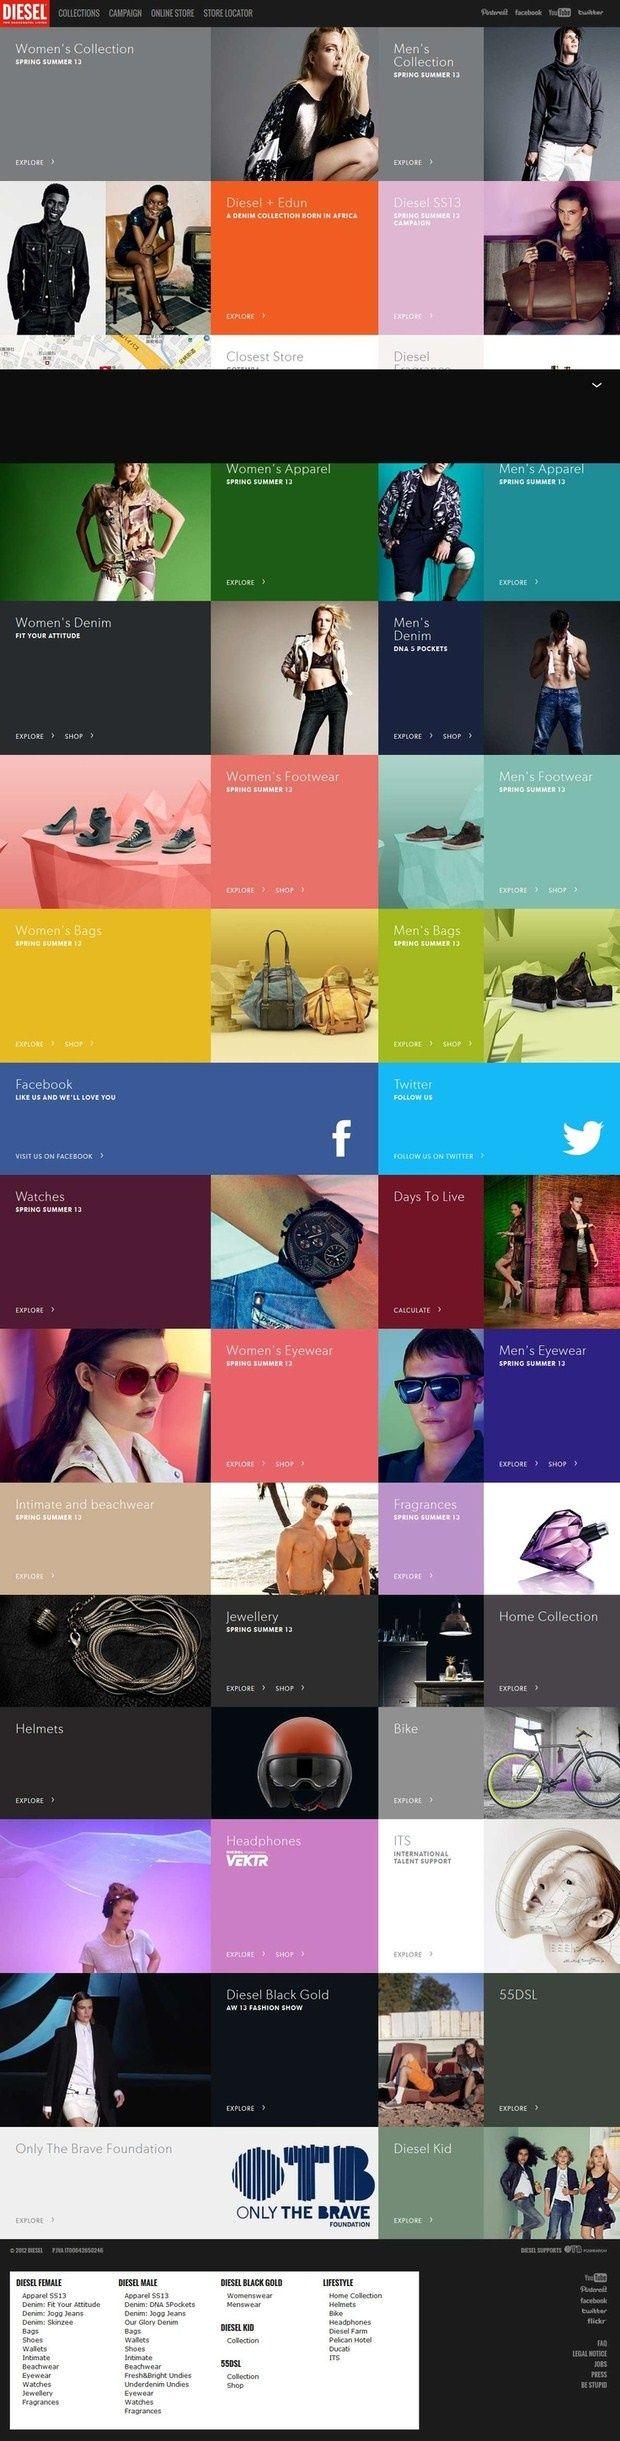 New Trends in Web Design   Abduzeedo Design Inspiration